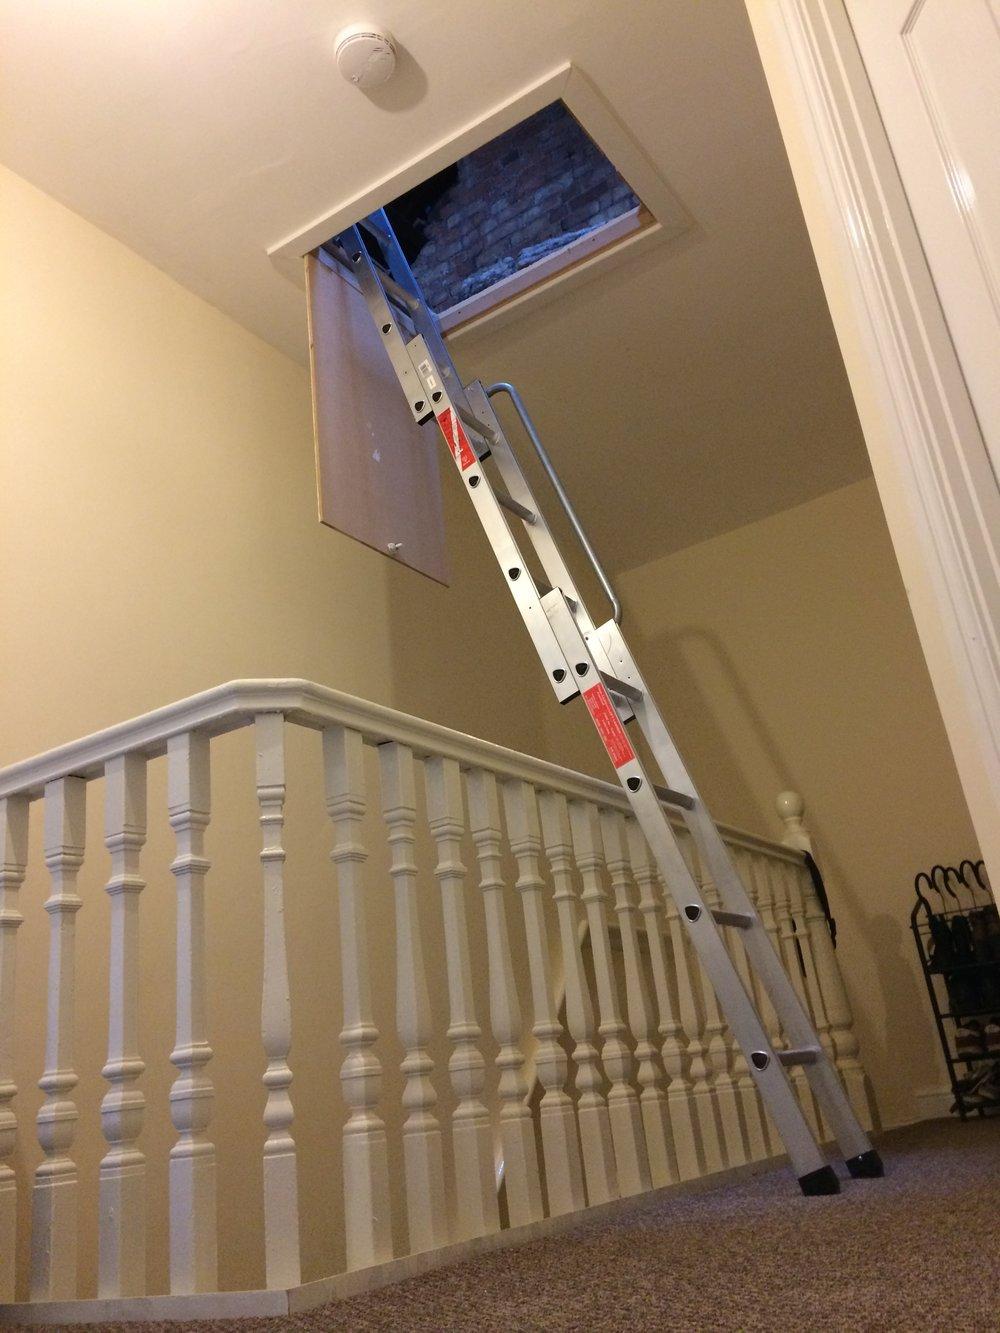 Titan 3 Stage Aluminium Loft Ladder in use.